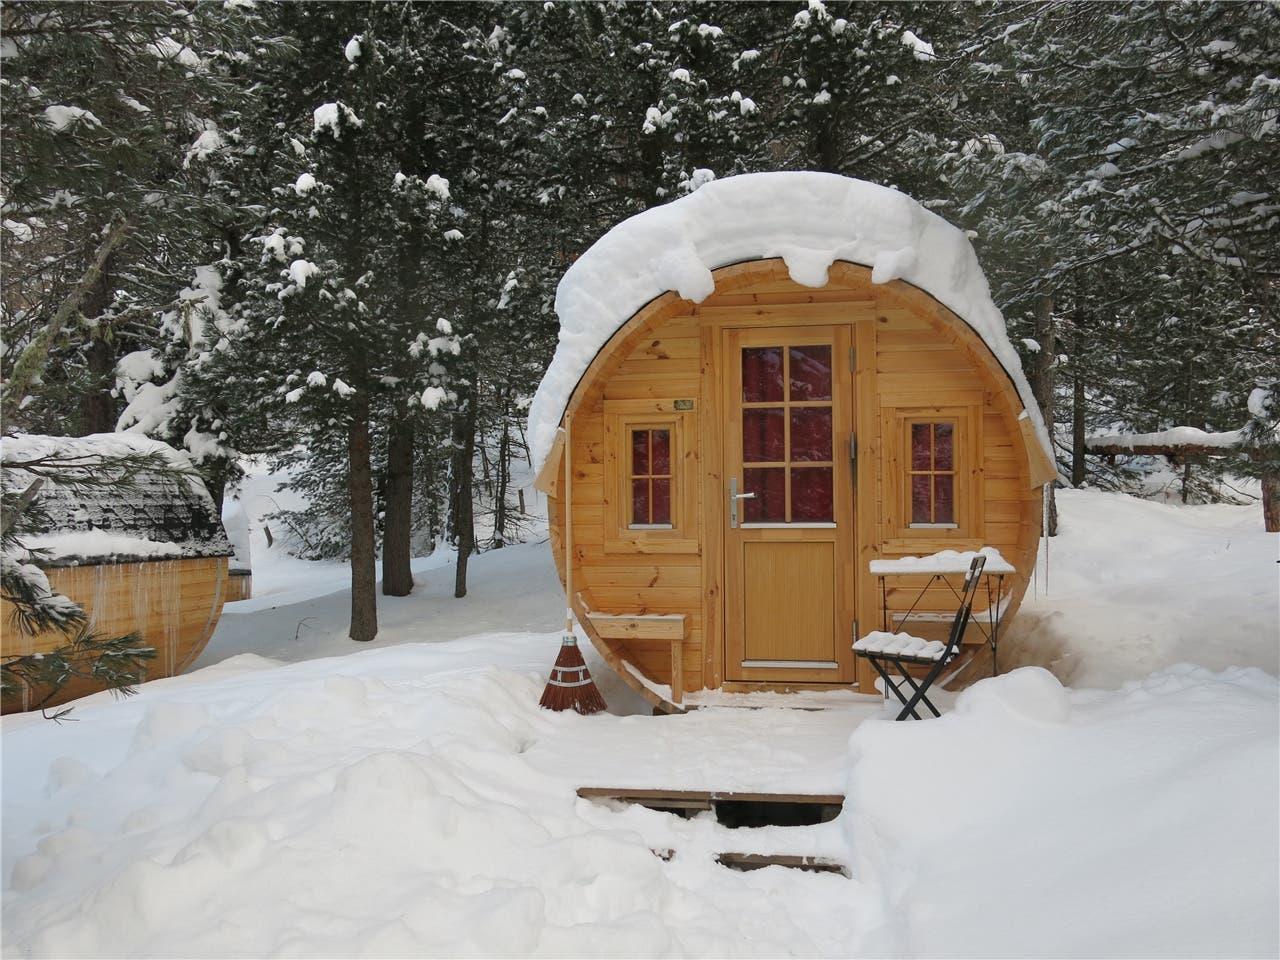 Campingplatz im Winter